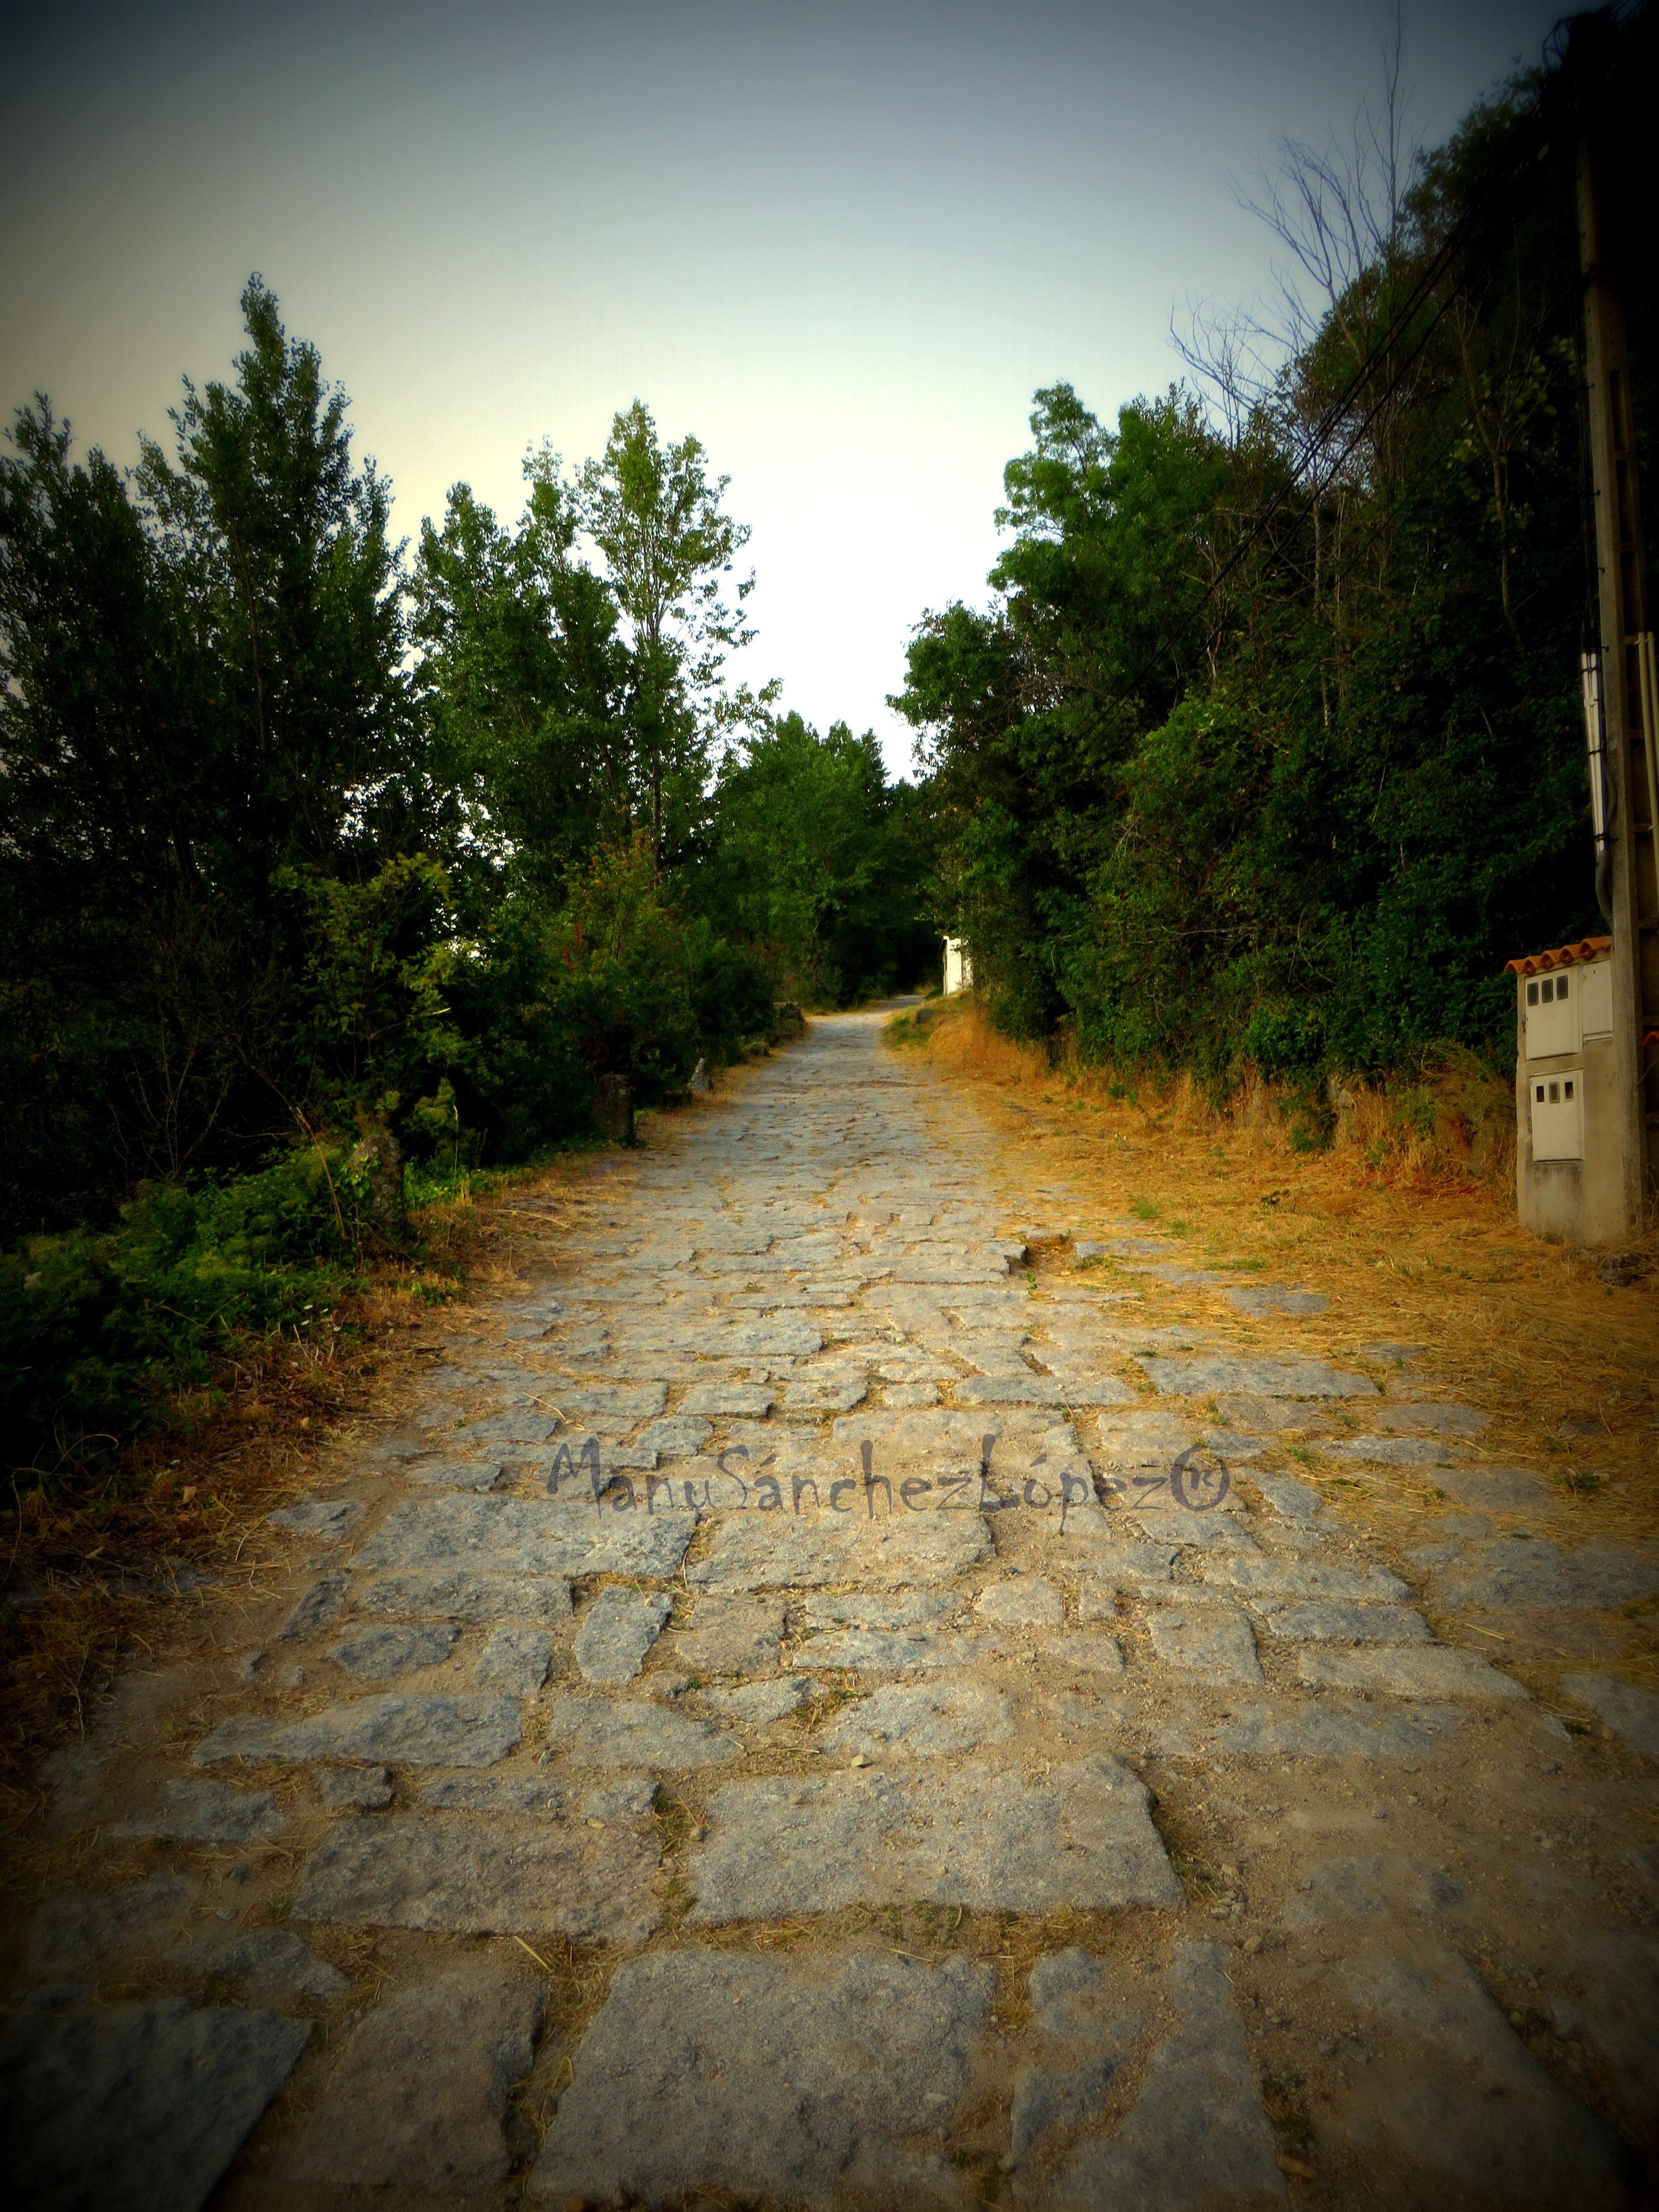 Baños Romanos De La Luisiana:Description Camino Romano Via de la Plata Baños de Montemayorjpg